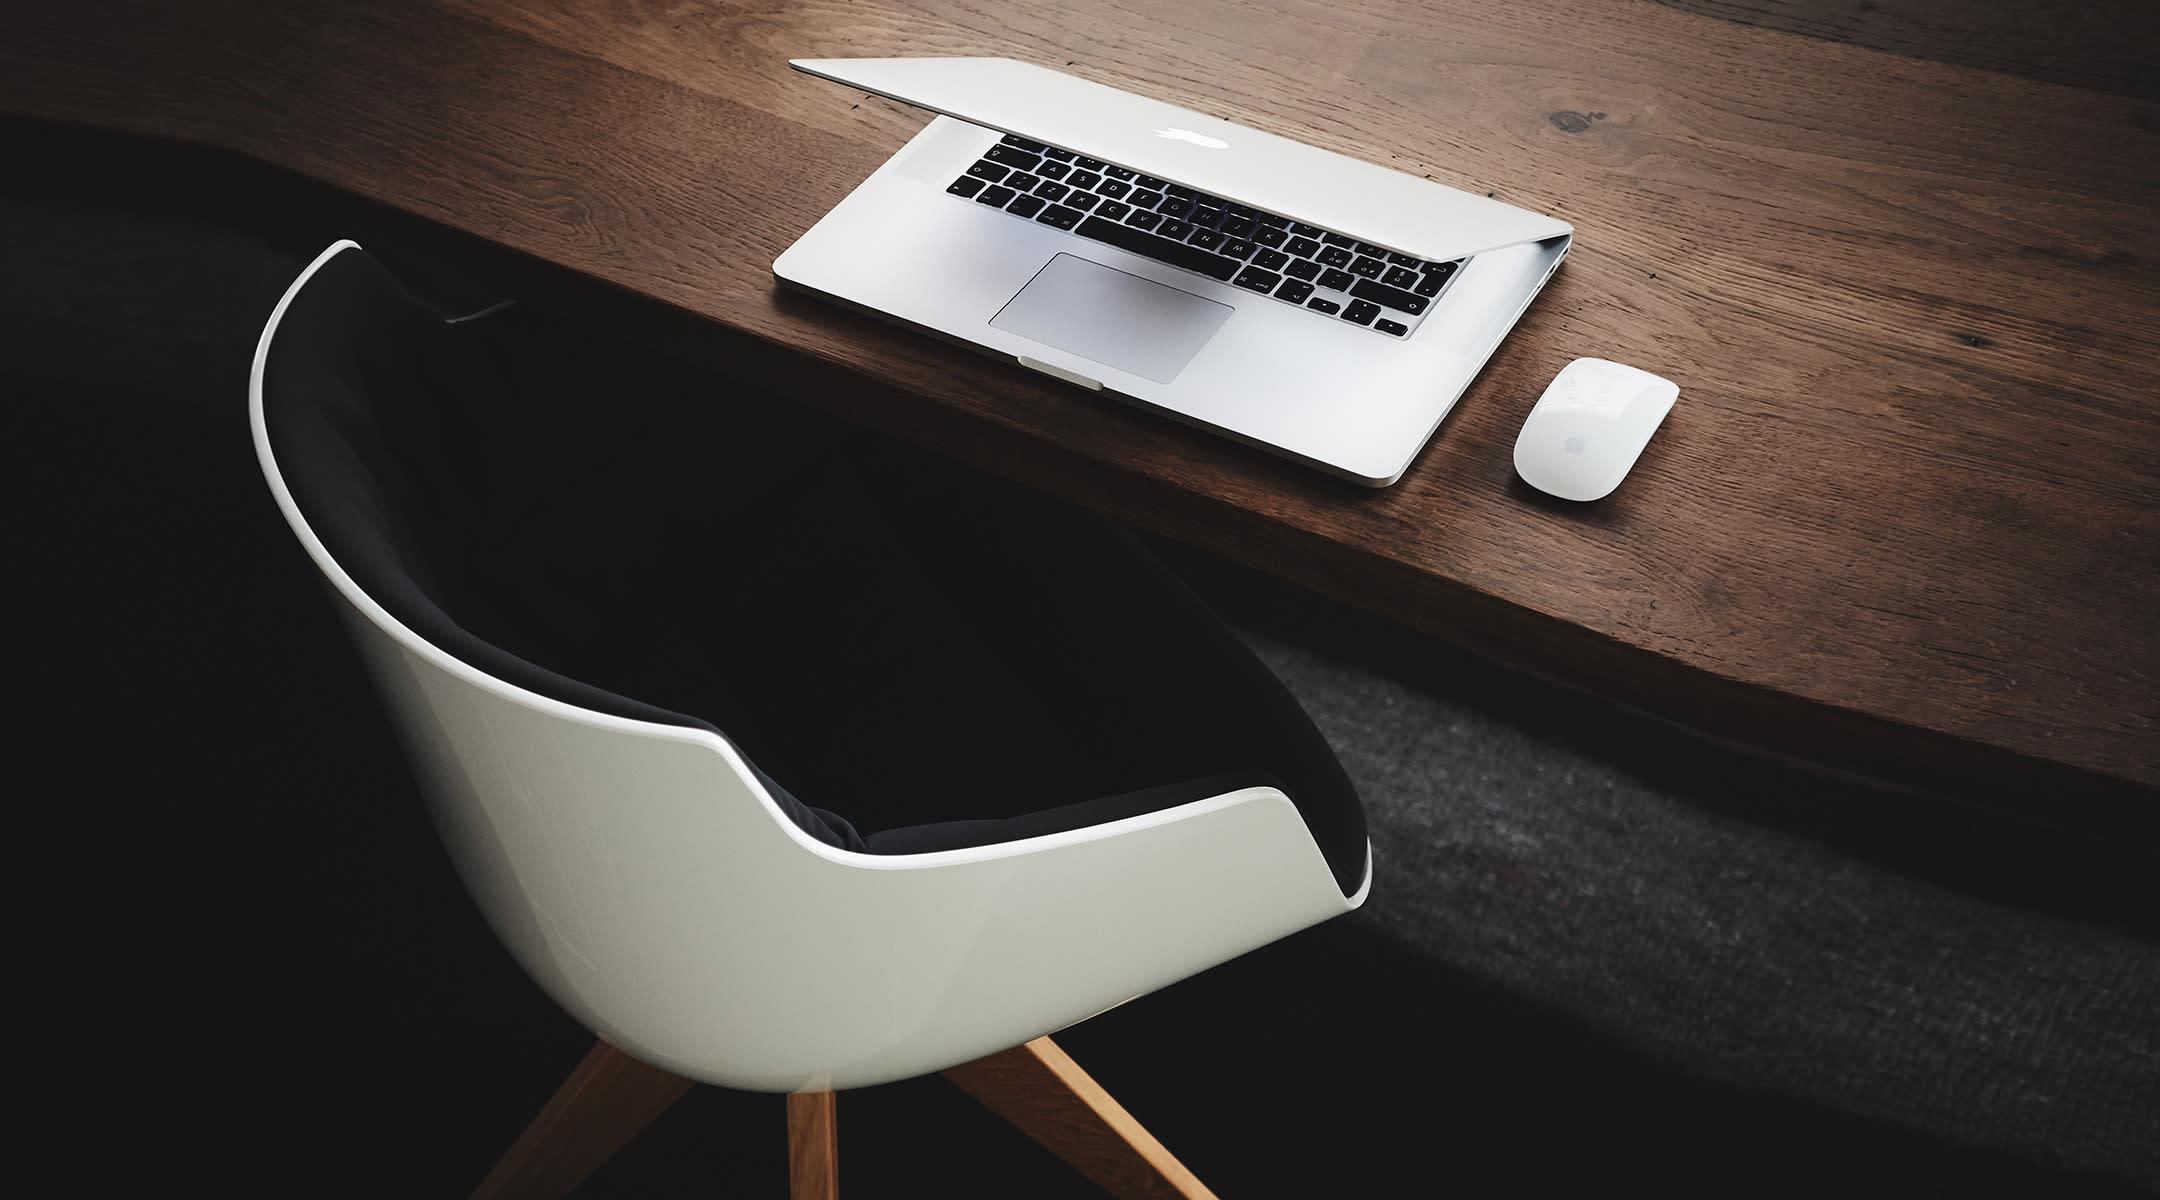 social media lap top on desk